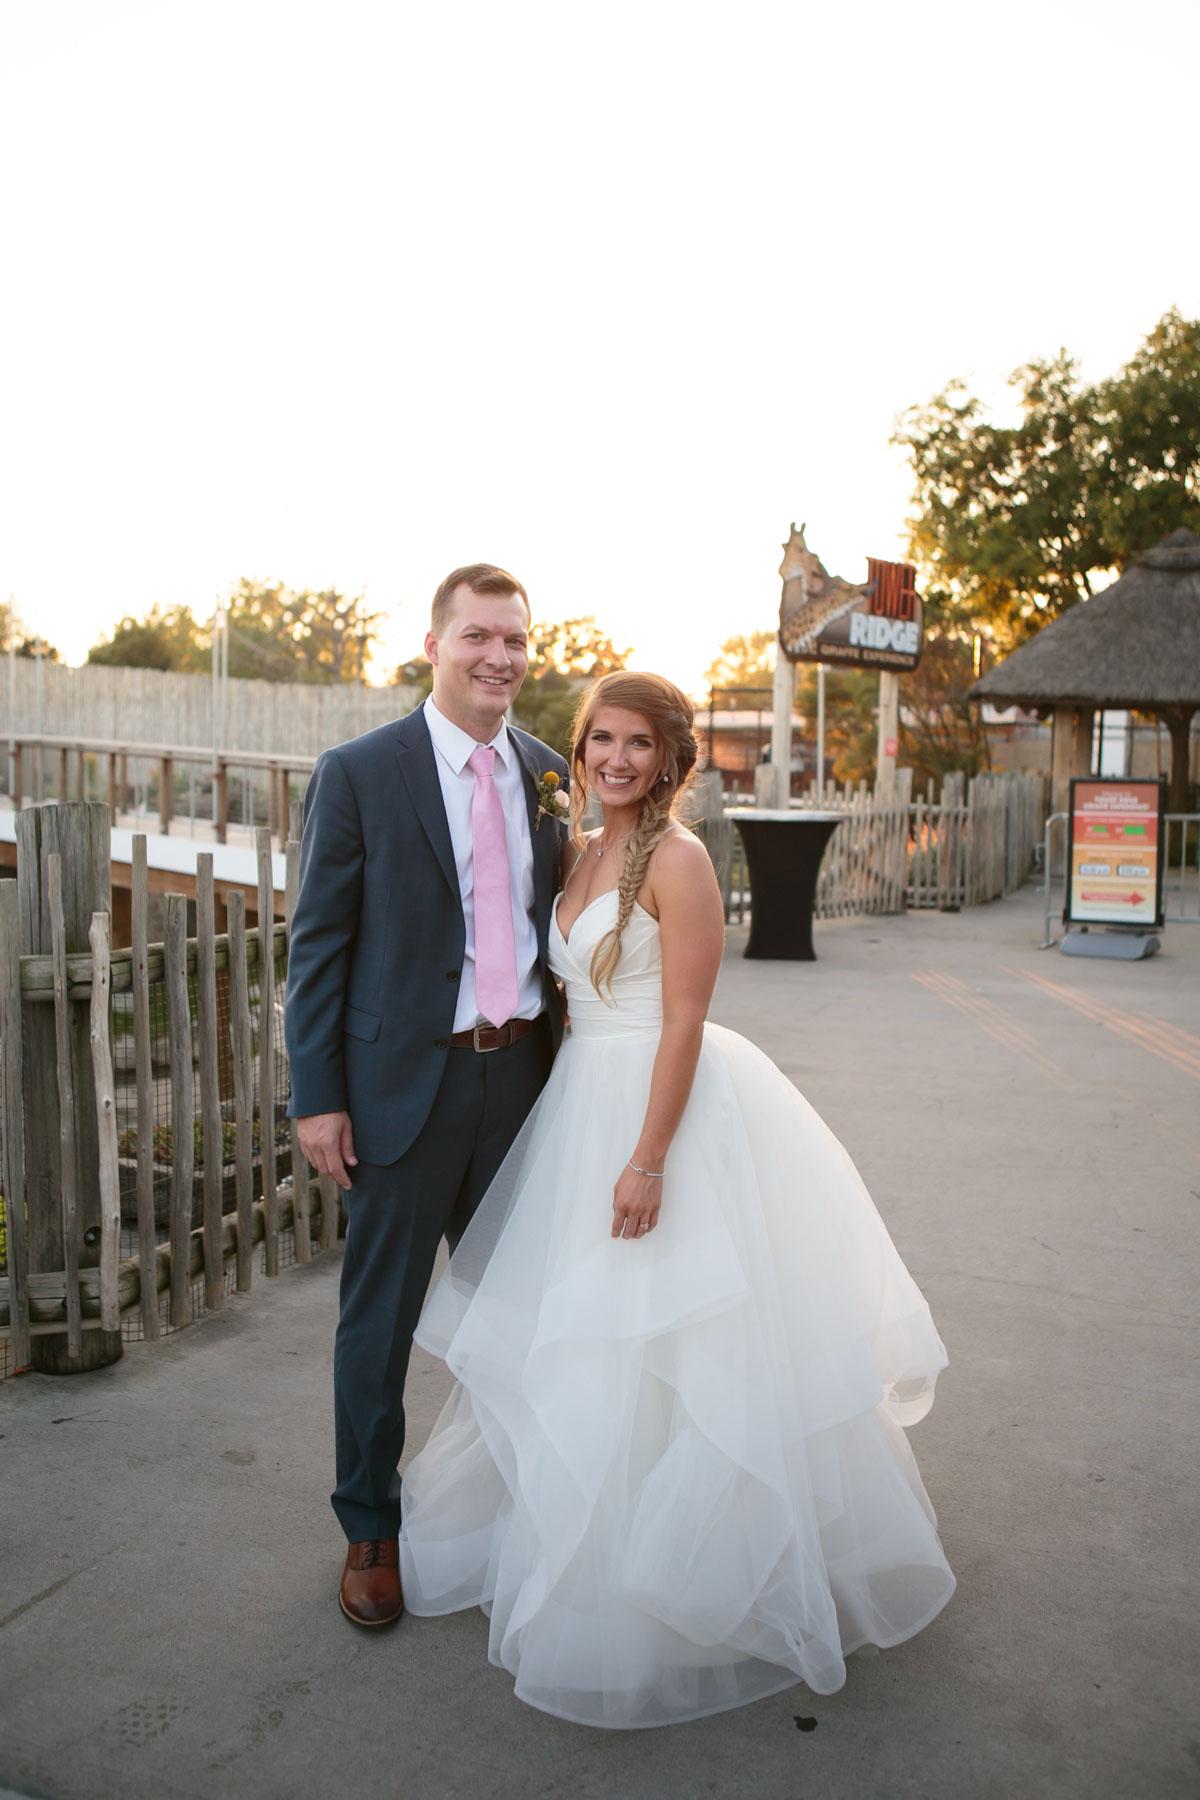 Shawna-and-Ryan-248.jpg